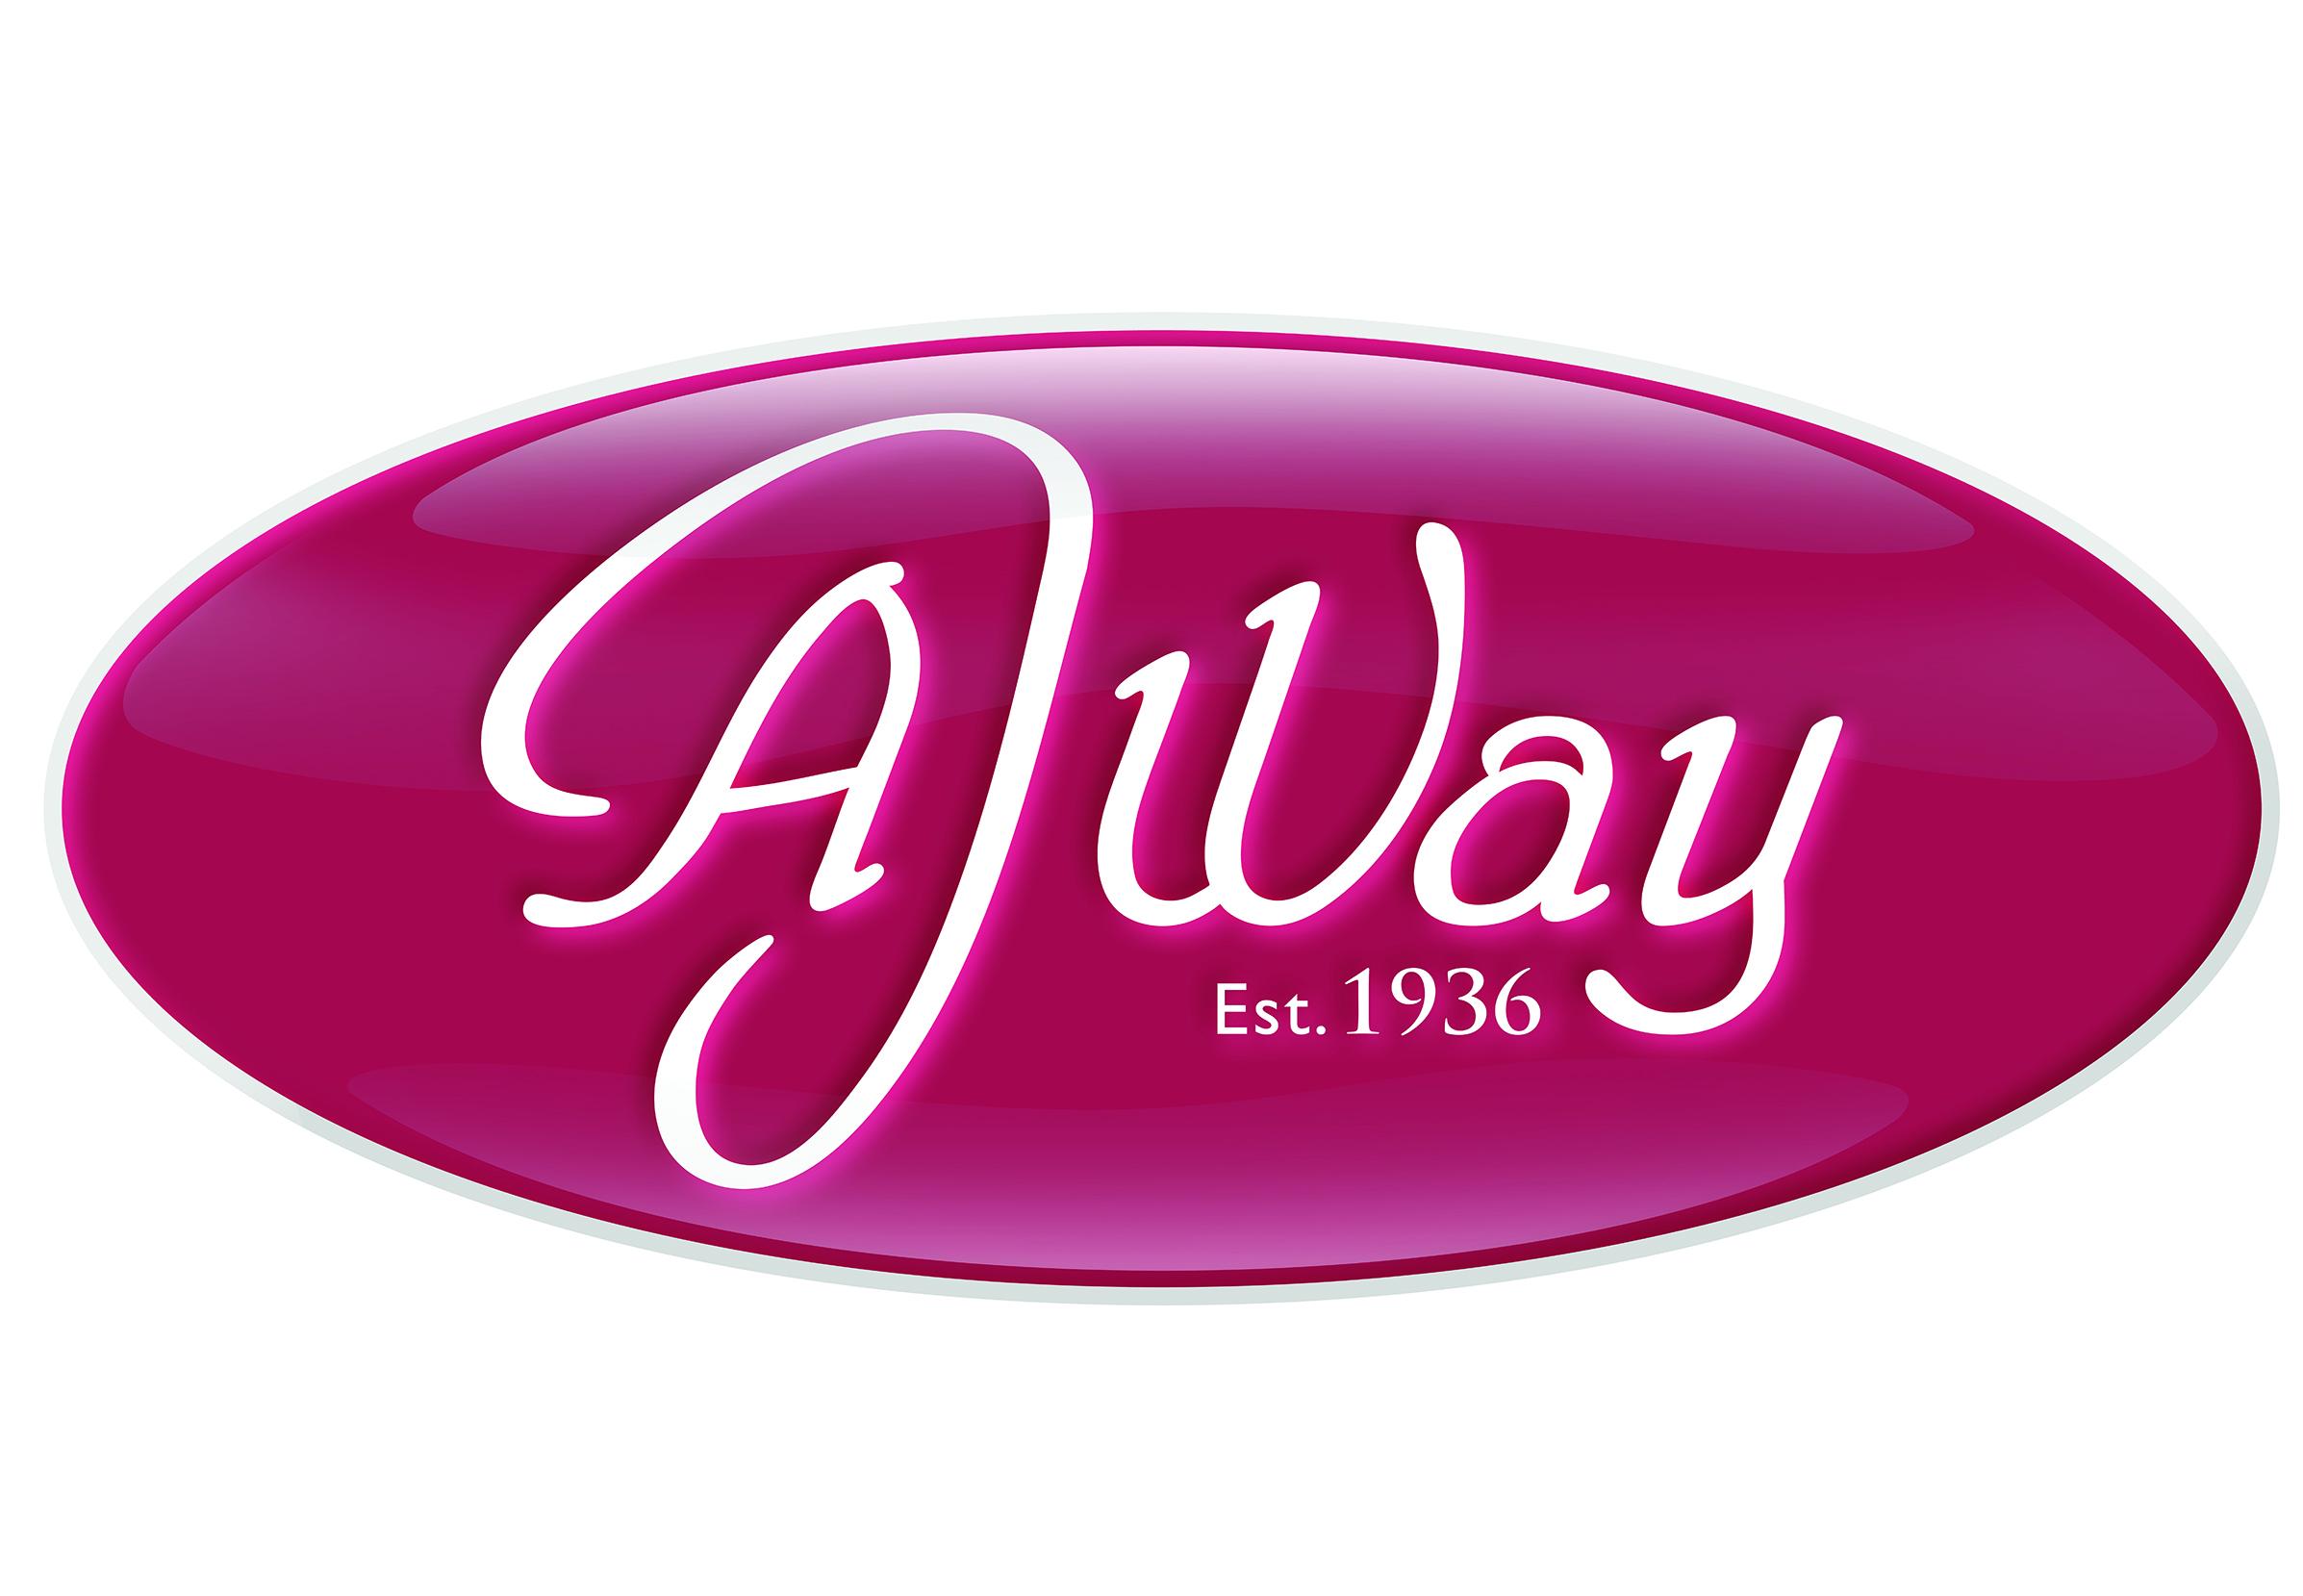 AJ Way and Co Ltd